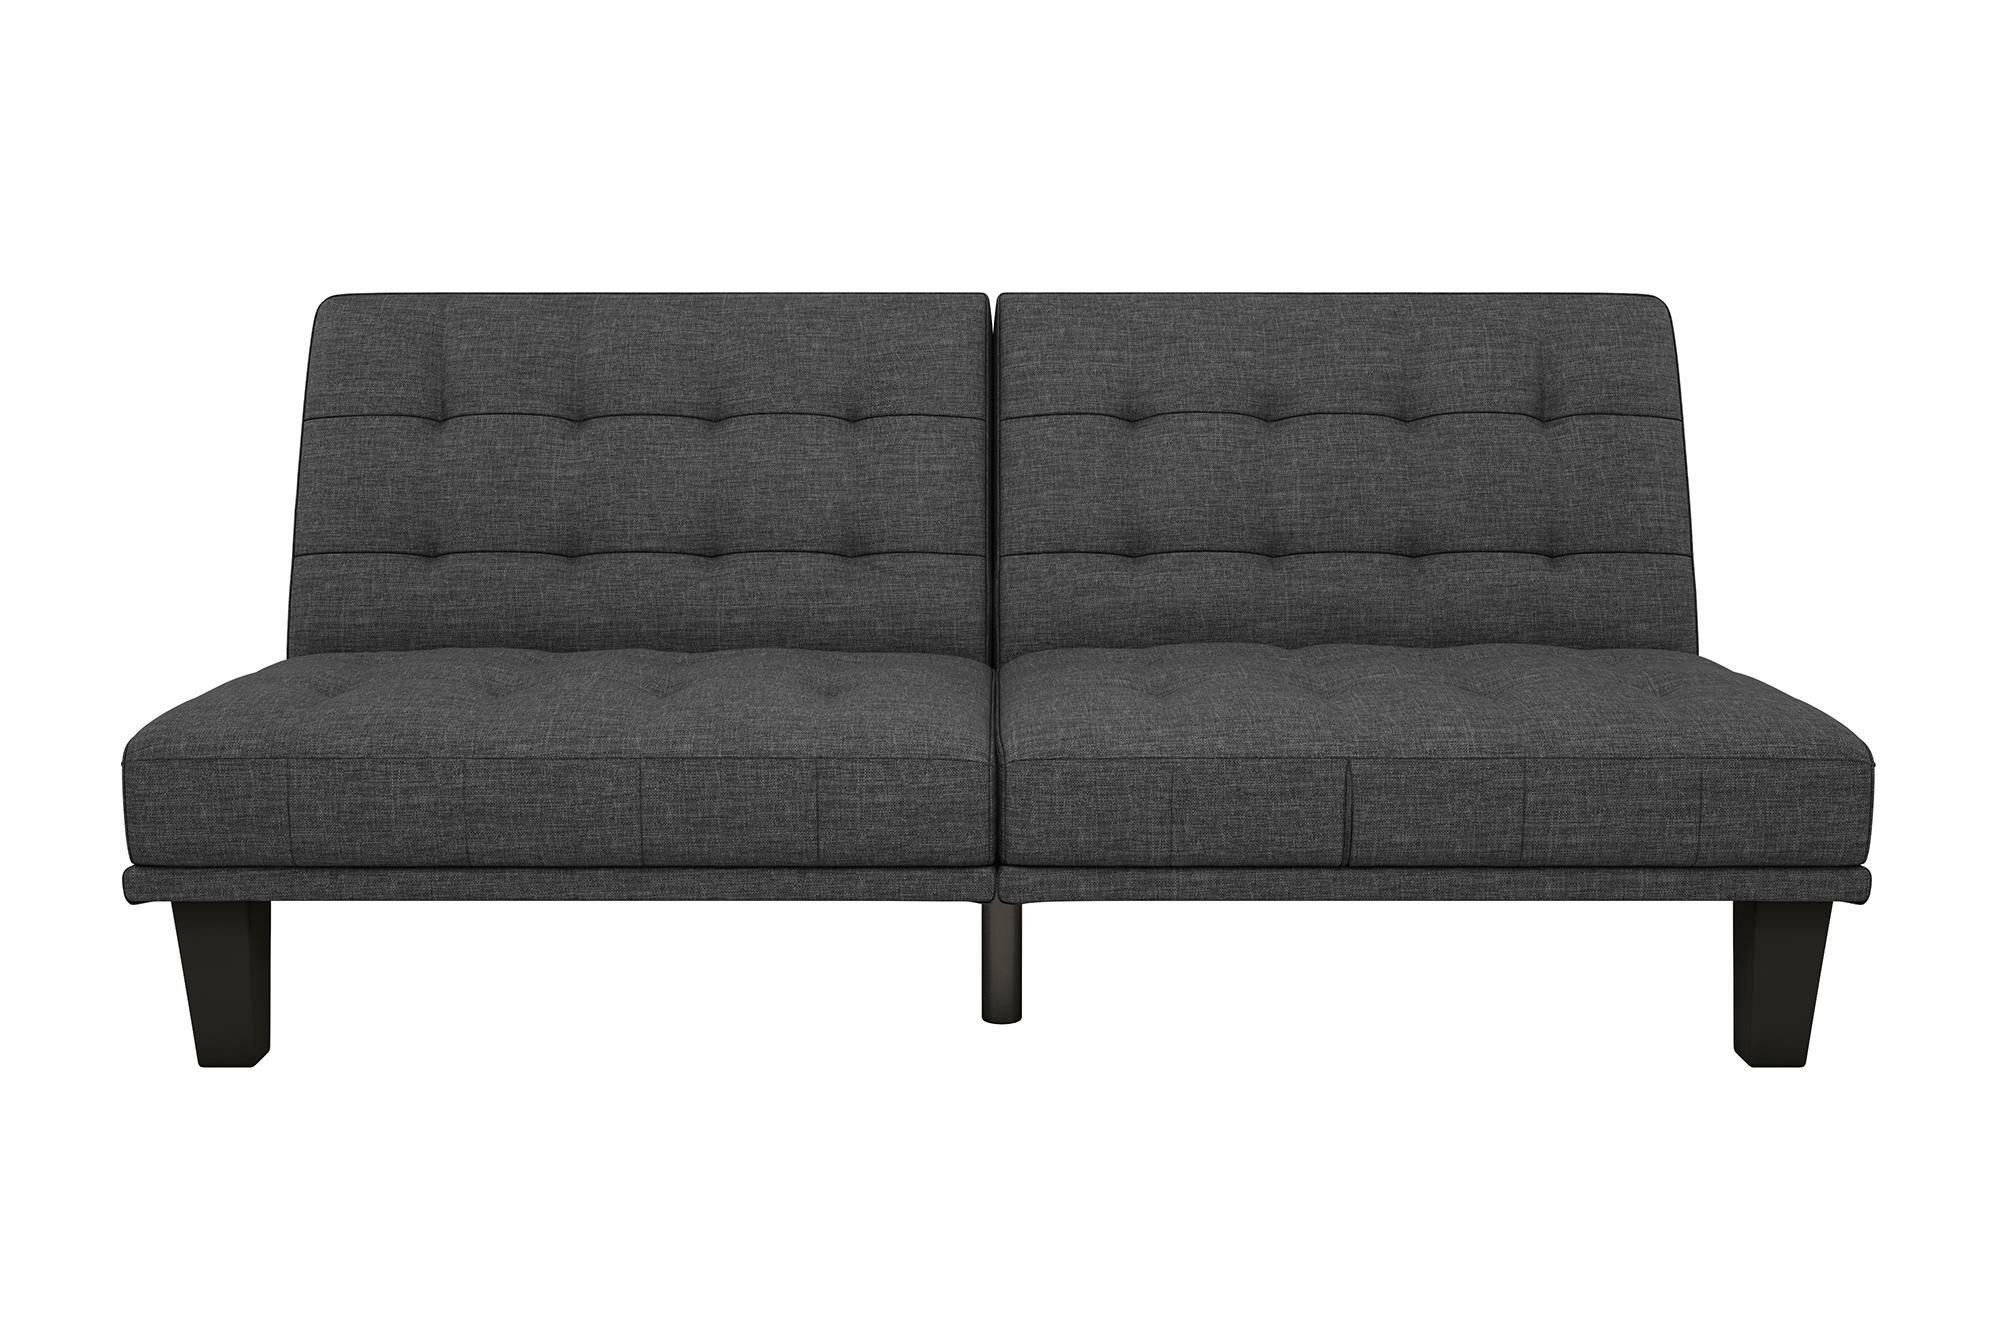 Wade Logan Haysi Futon Lounger Convertible Sofa Reviews